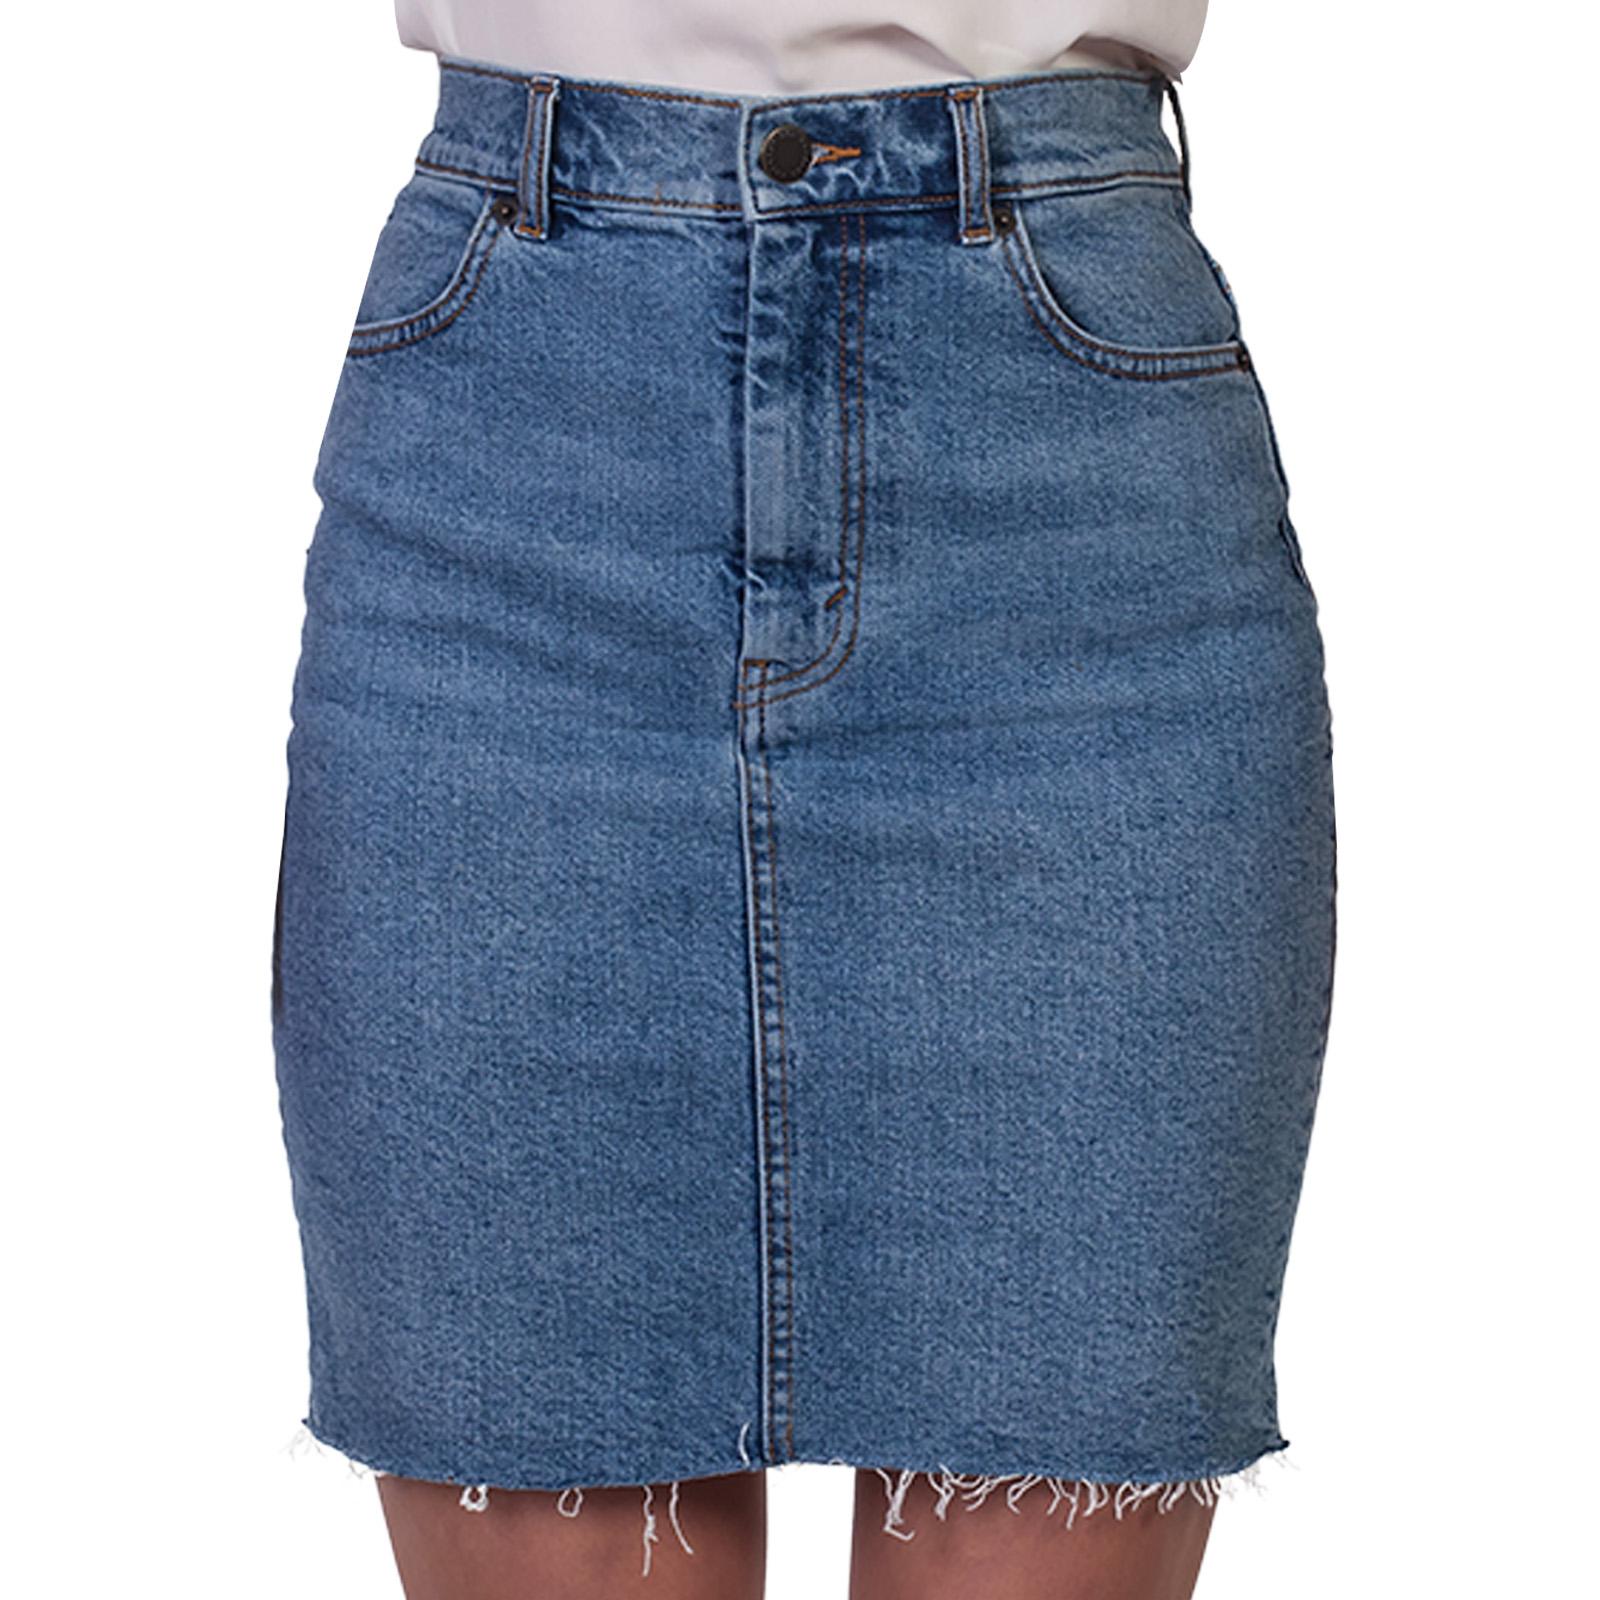 Джинсовая юбка Los Angeles Atelier